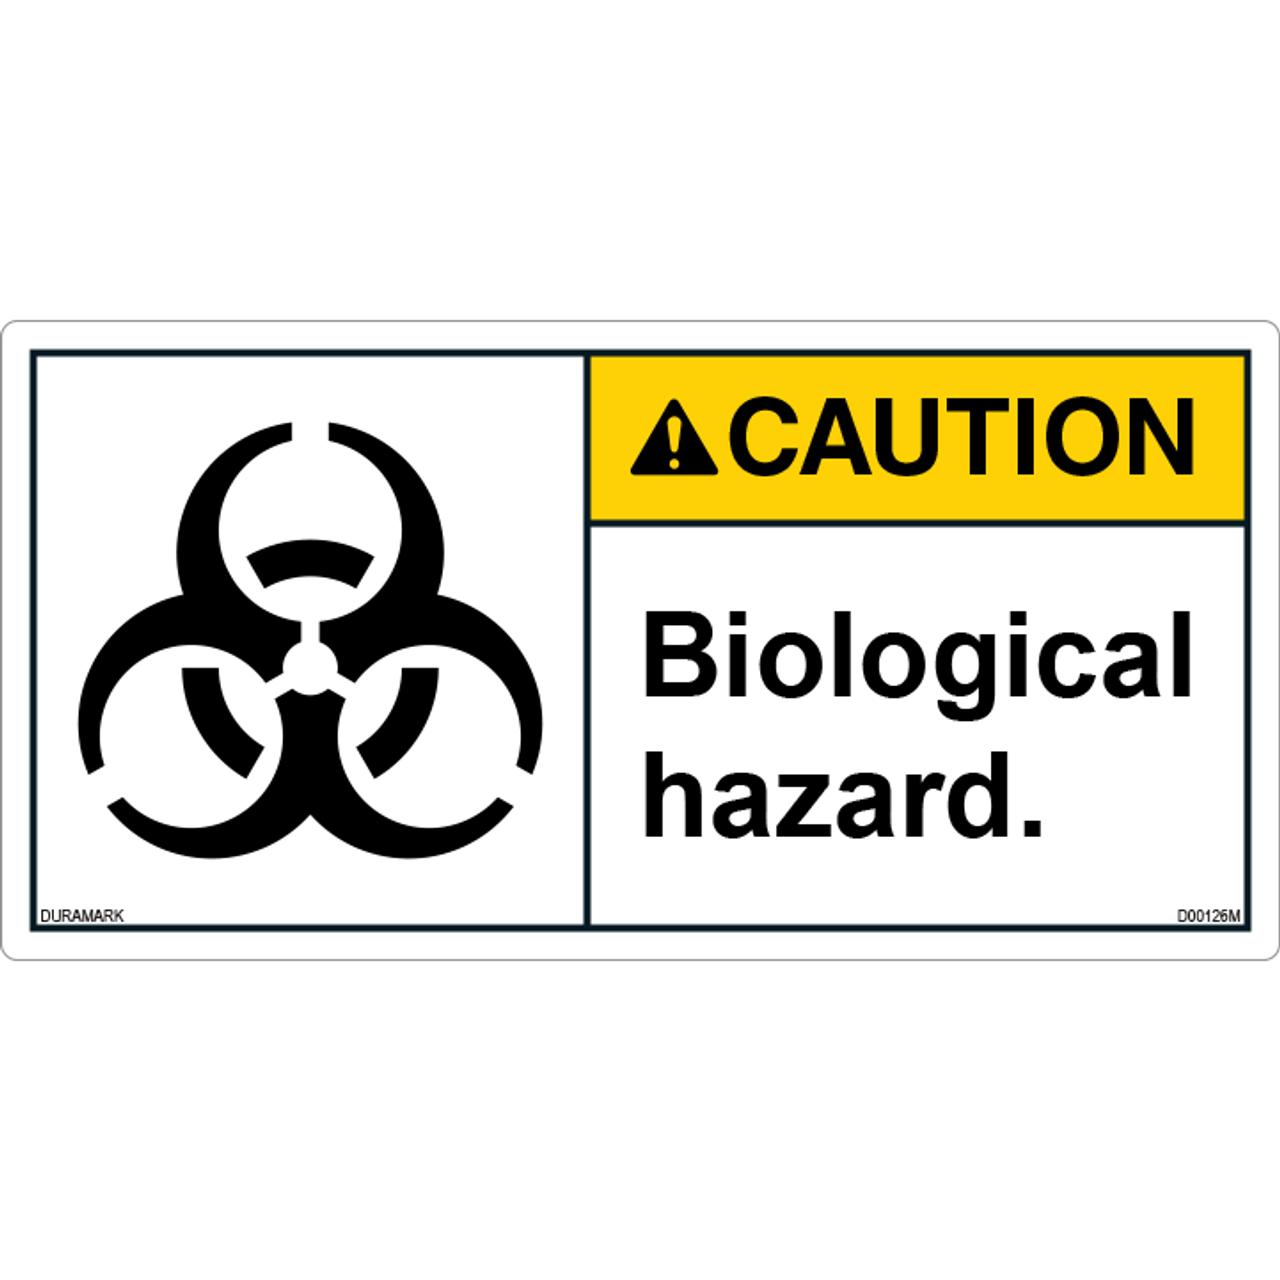 Yellow Safety Warning Sign Adhesive Gloss Vinyl Sticker Danger Electrical Hazard